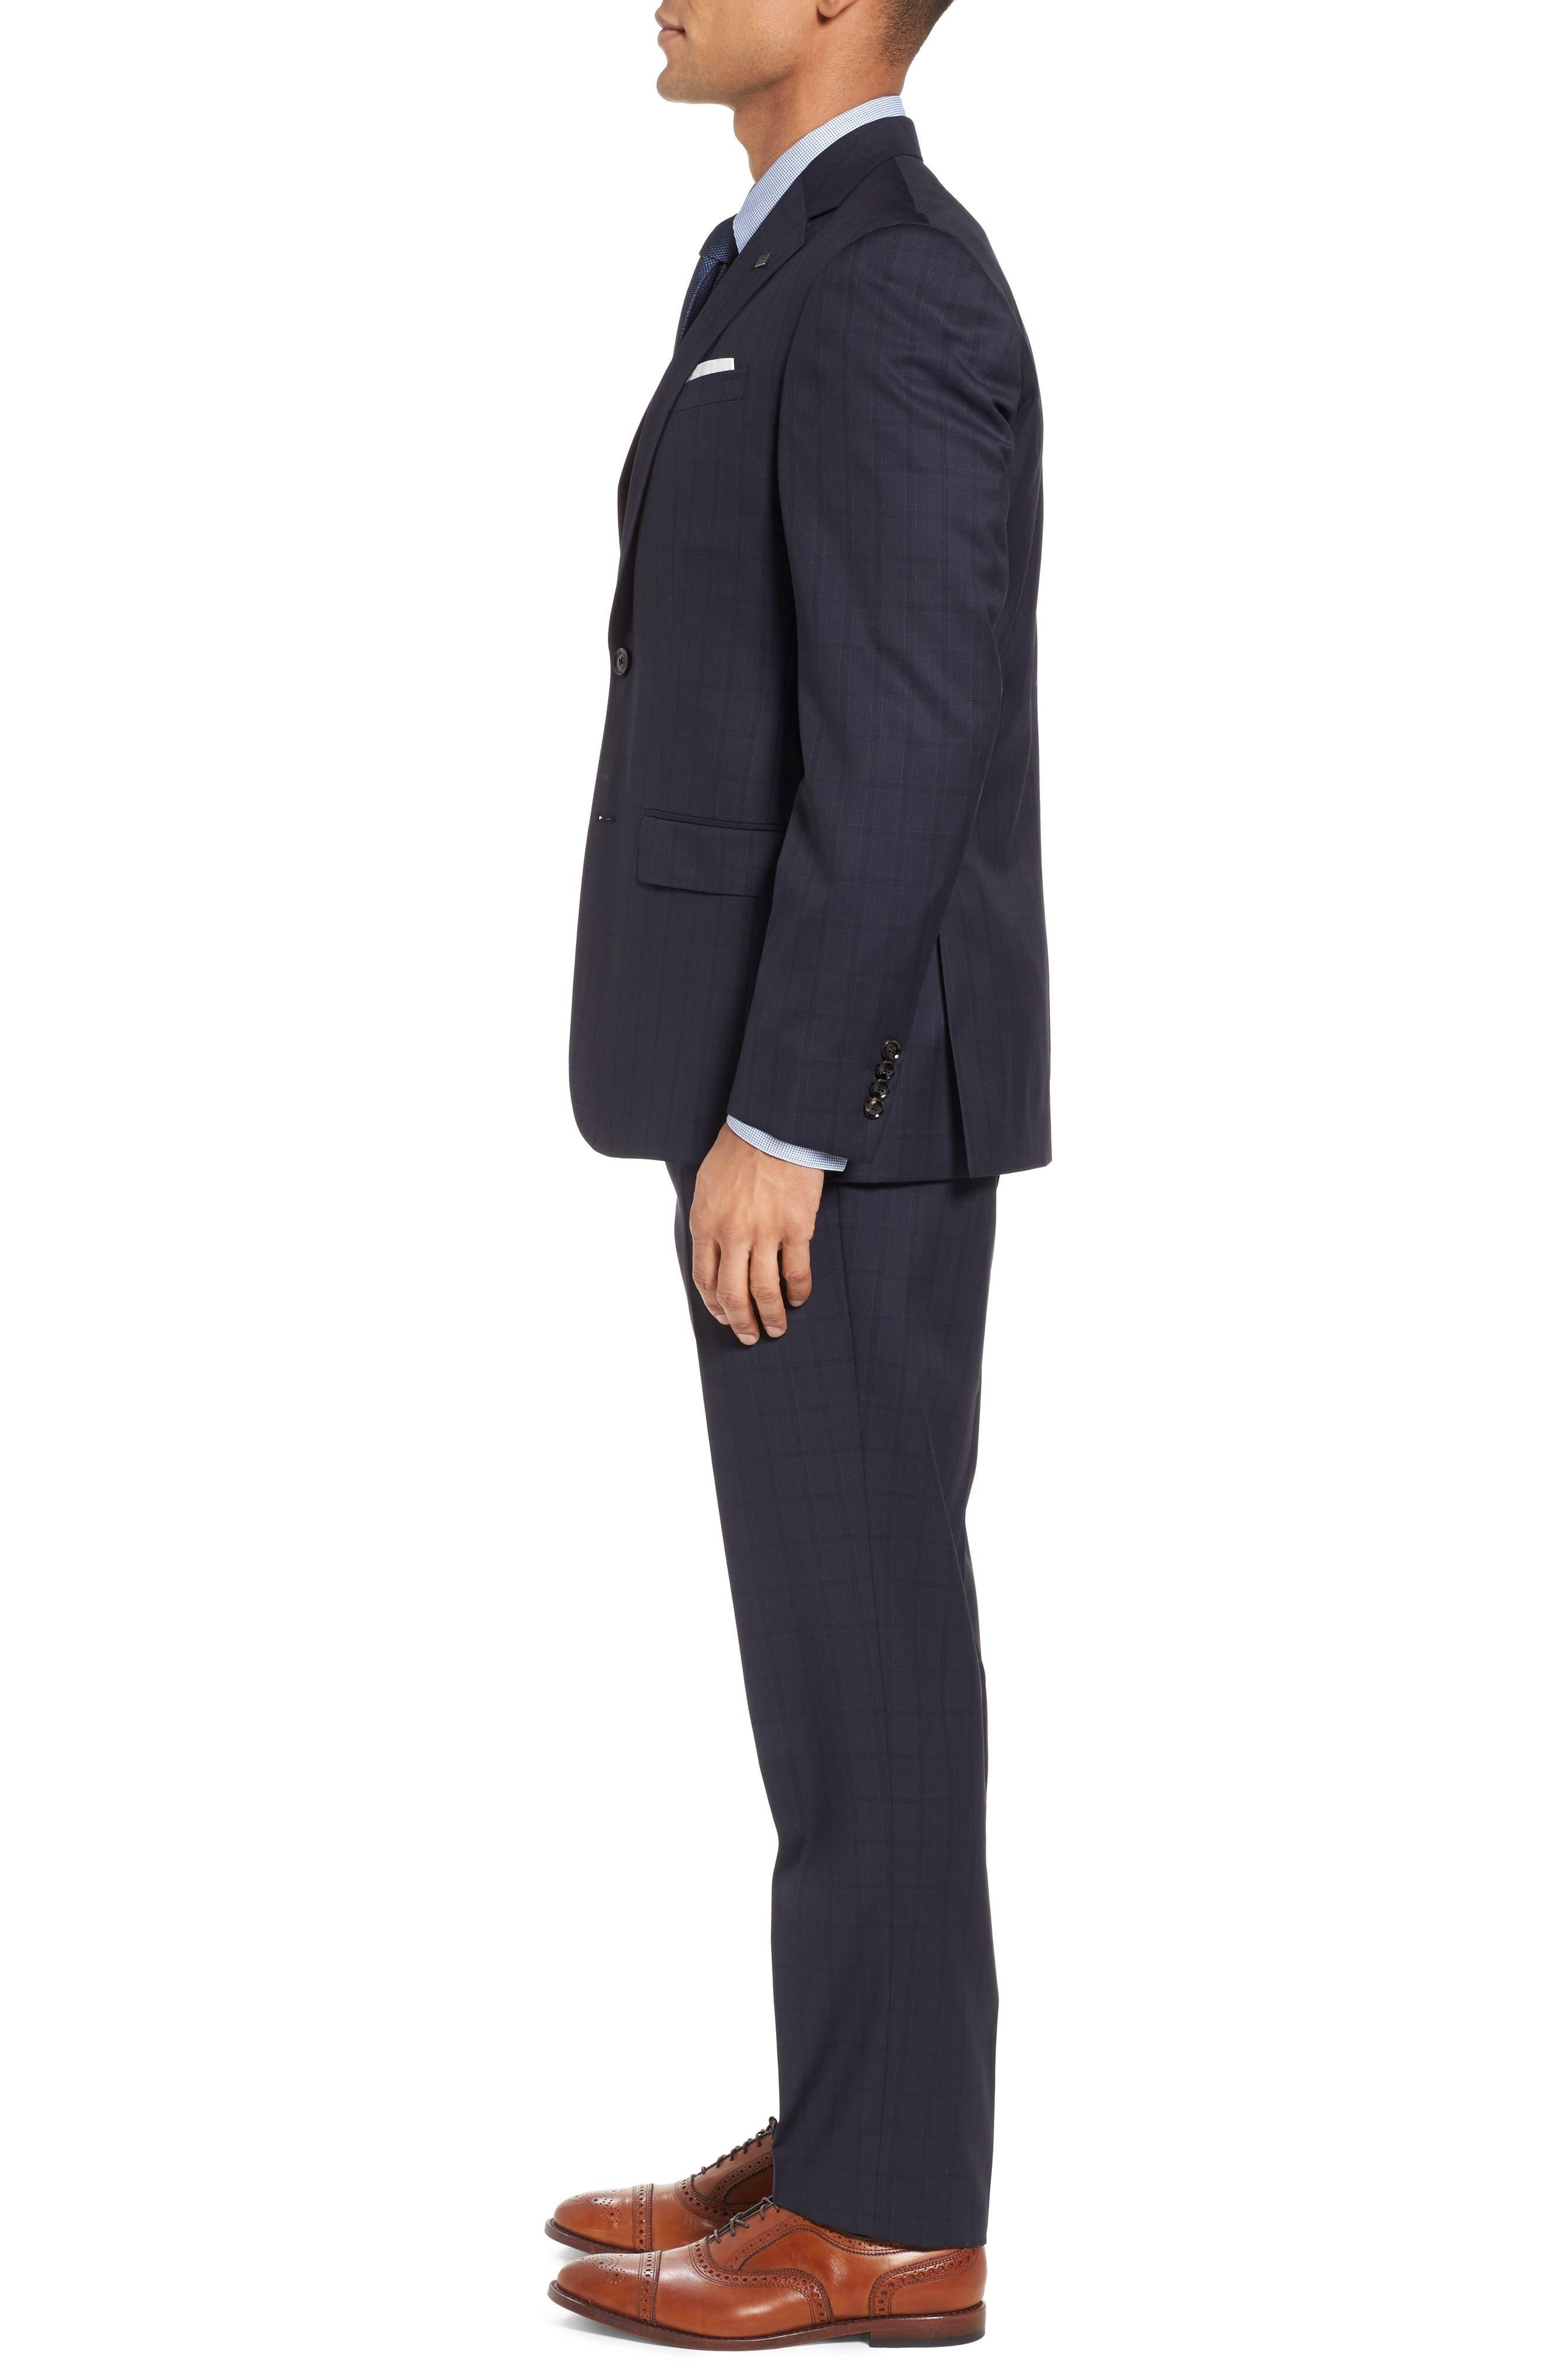 Jay Trim Fit Check Wool Suit,                             Alternate thumbnail 3, color,                             410